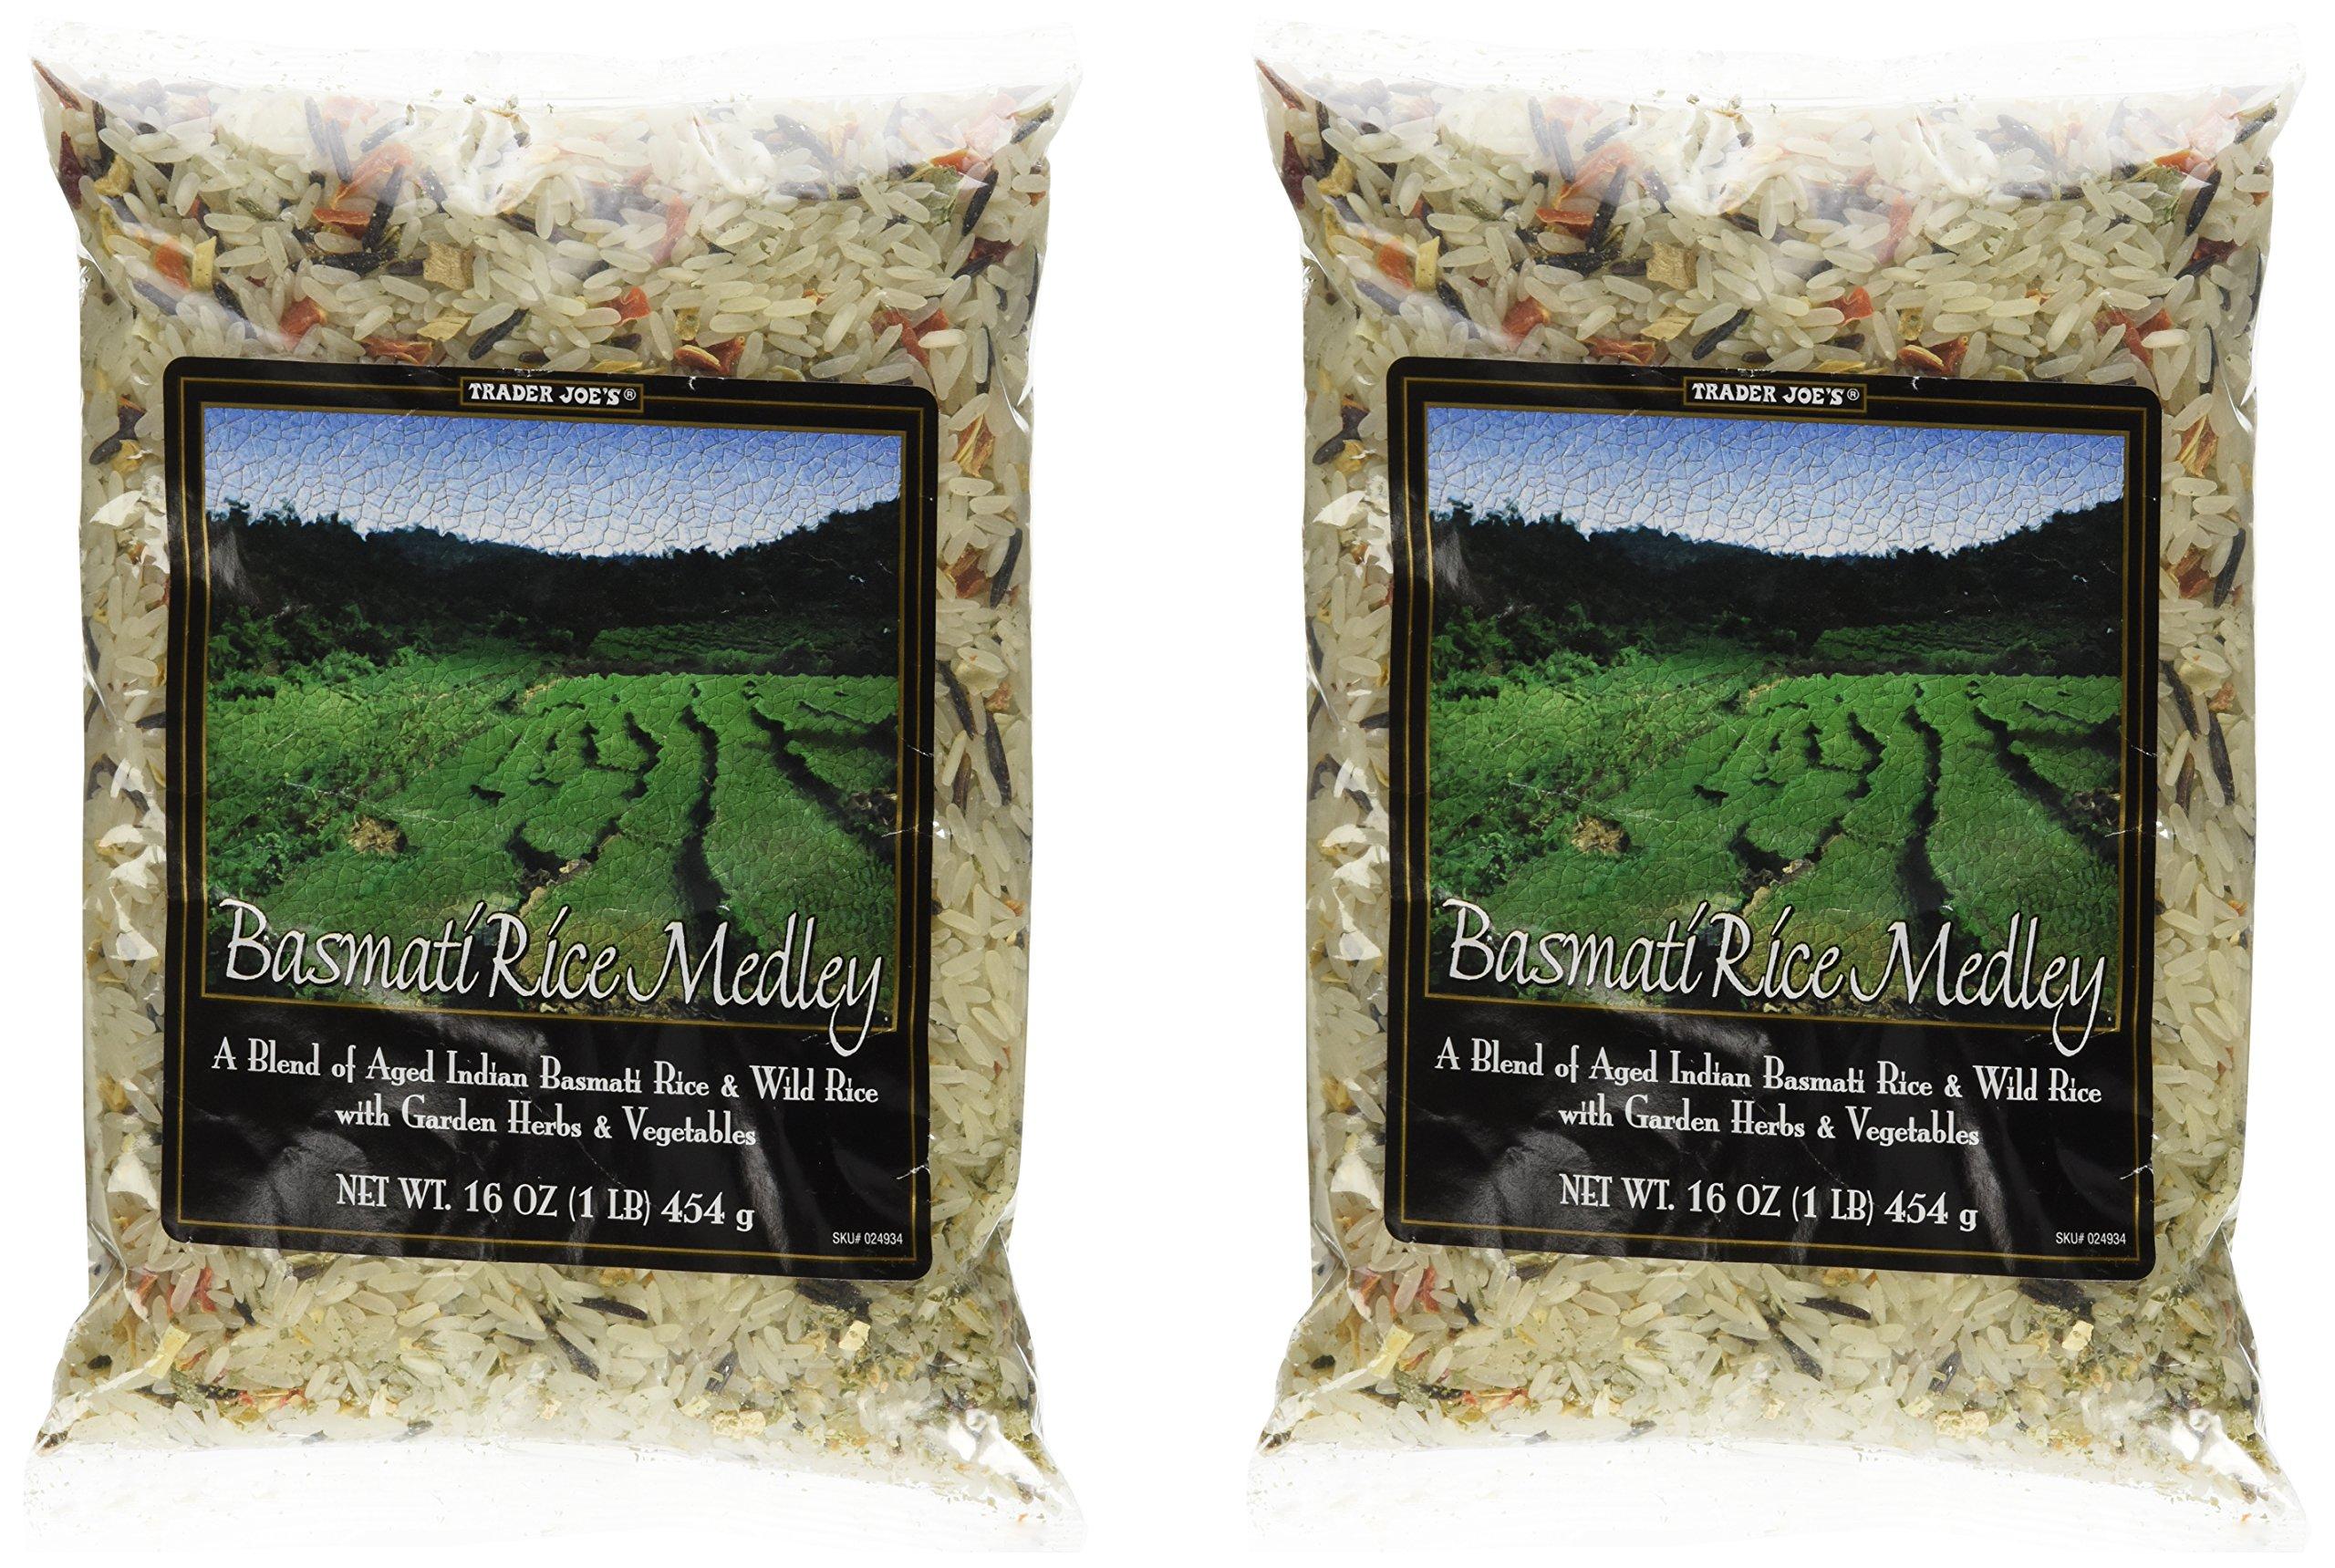 Basmati Rice Medley (2 Pack)